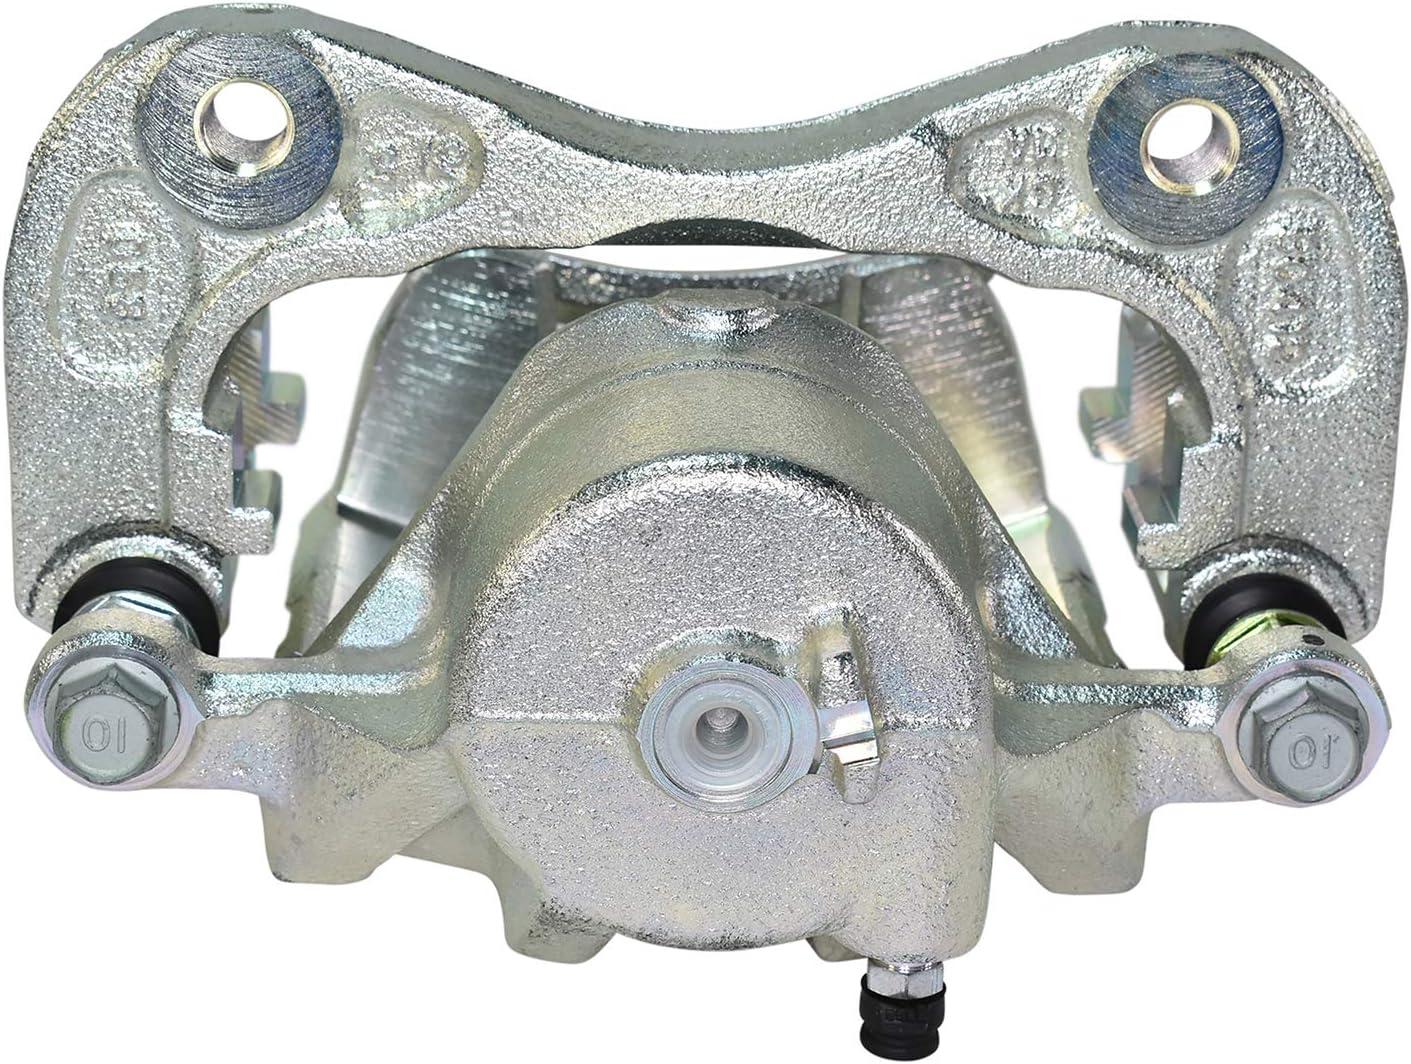 Limited Special Price New Mando NEW before selling 16A5150 Brake Caliper Equipment Original